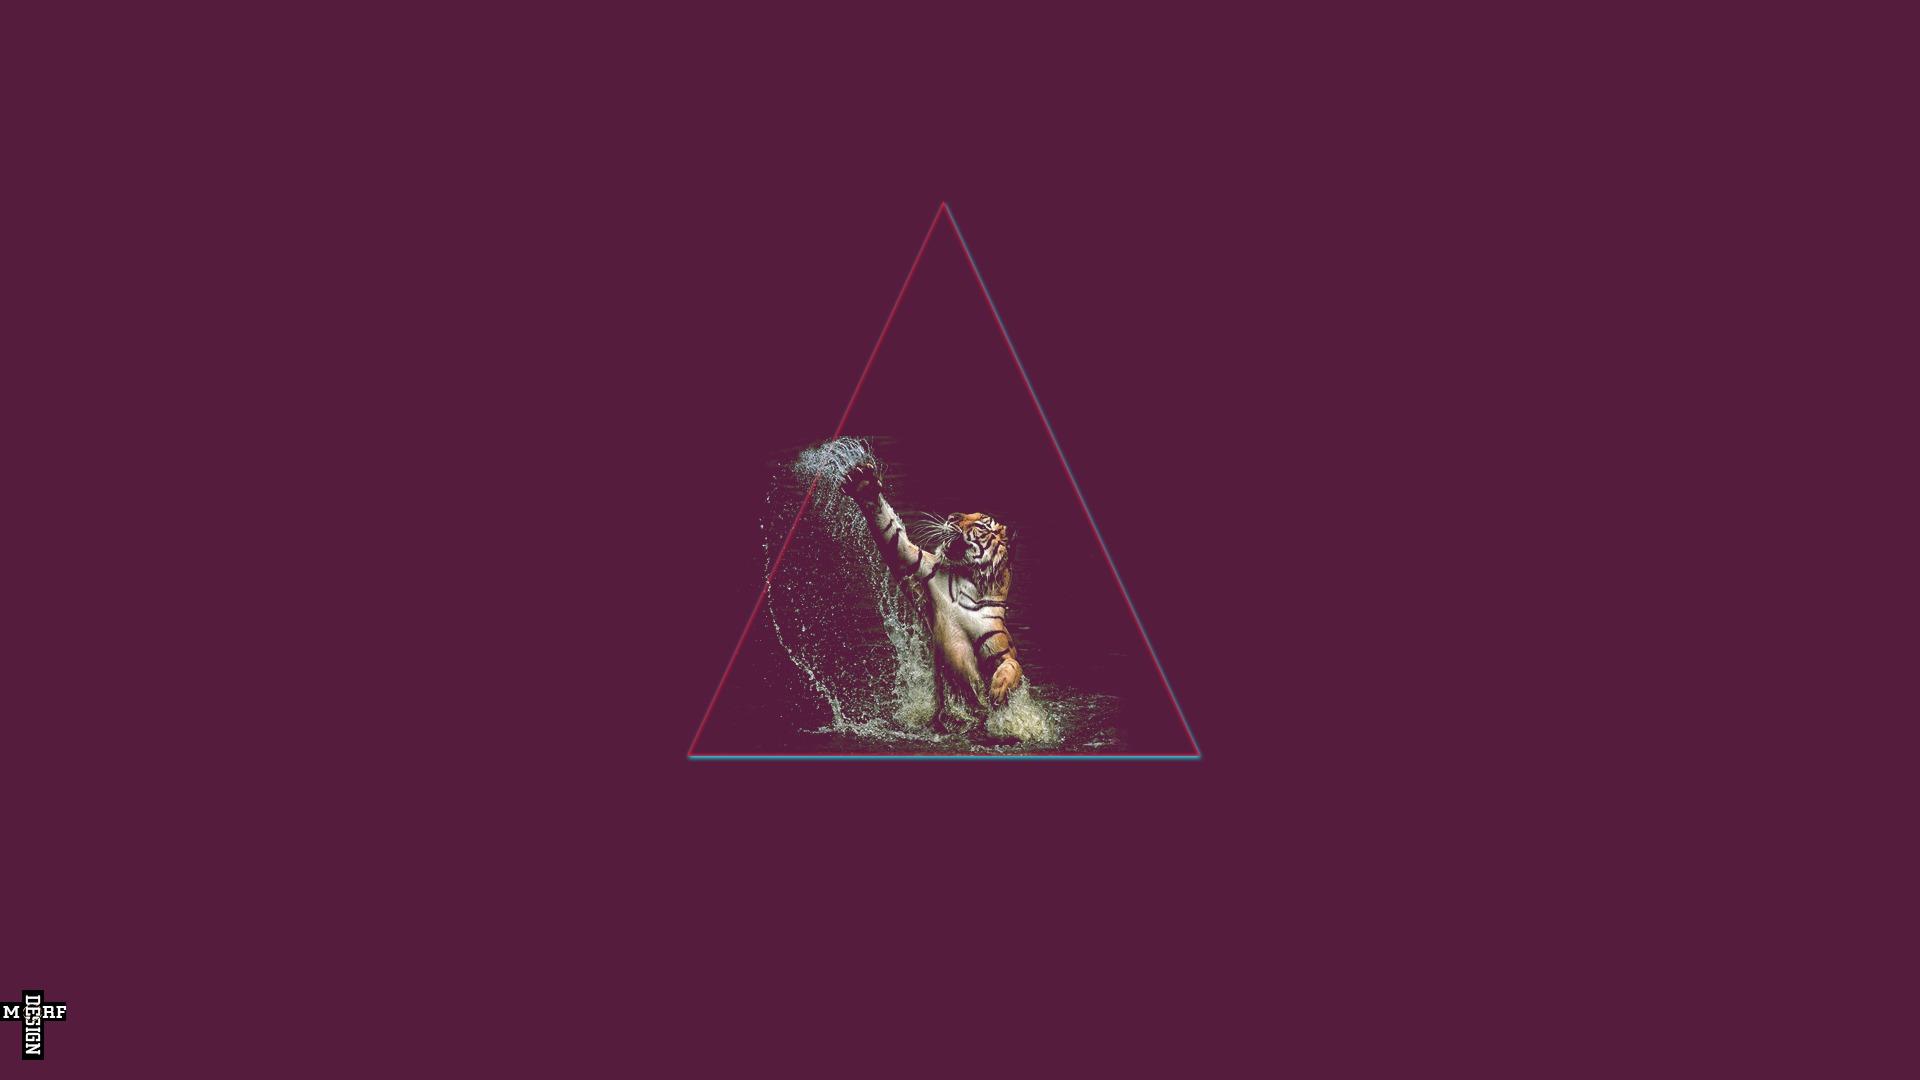 Illustration Tiger Triangle Shape Swag Screenshot Aggression